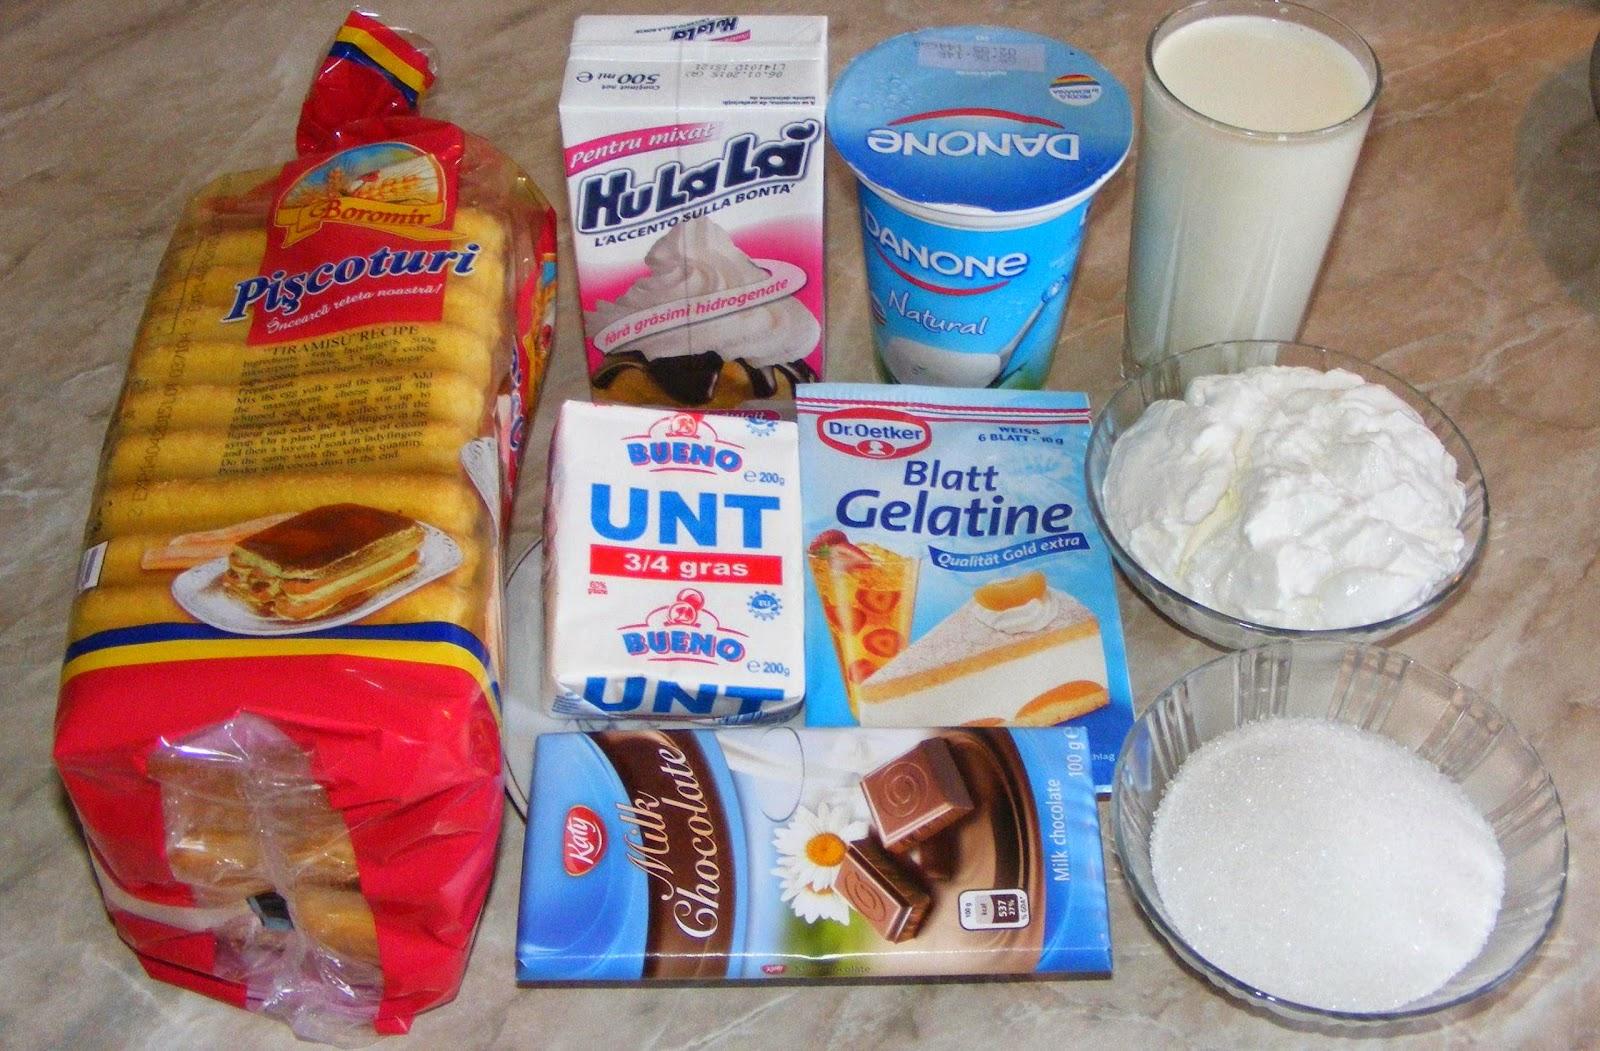 ingrediente pentru tort de visine si piscoturi, cum se prepara tortul de fructe, cum facem tortul de fructe, cum preparam tortul de visine si piscoturi, cum se prepara prajitura cu visine,